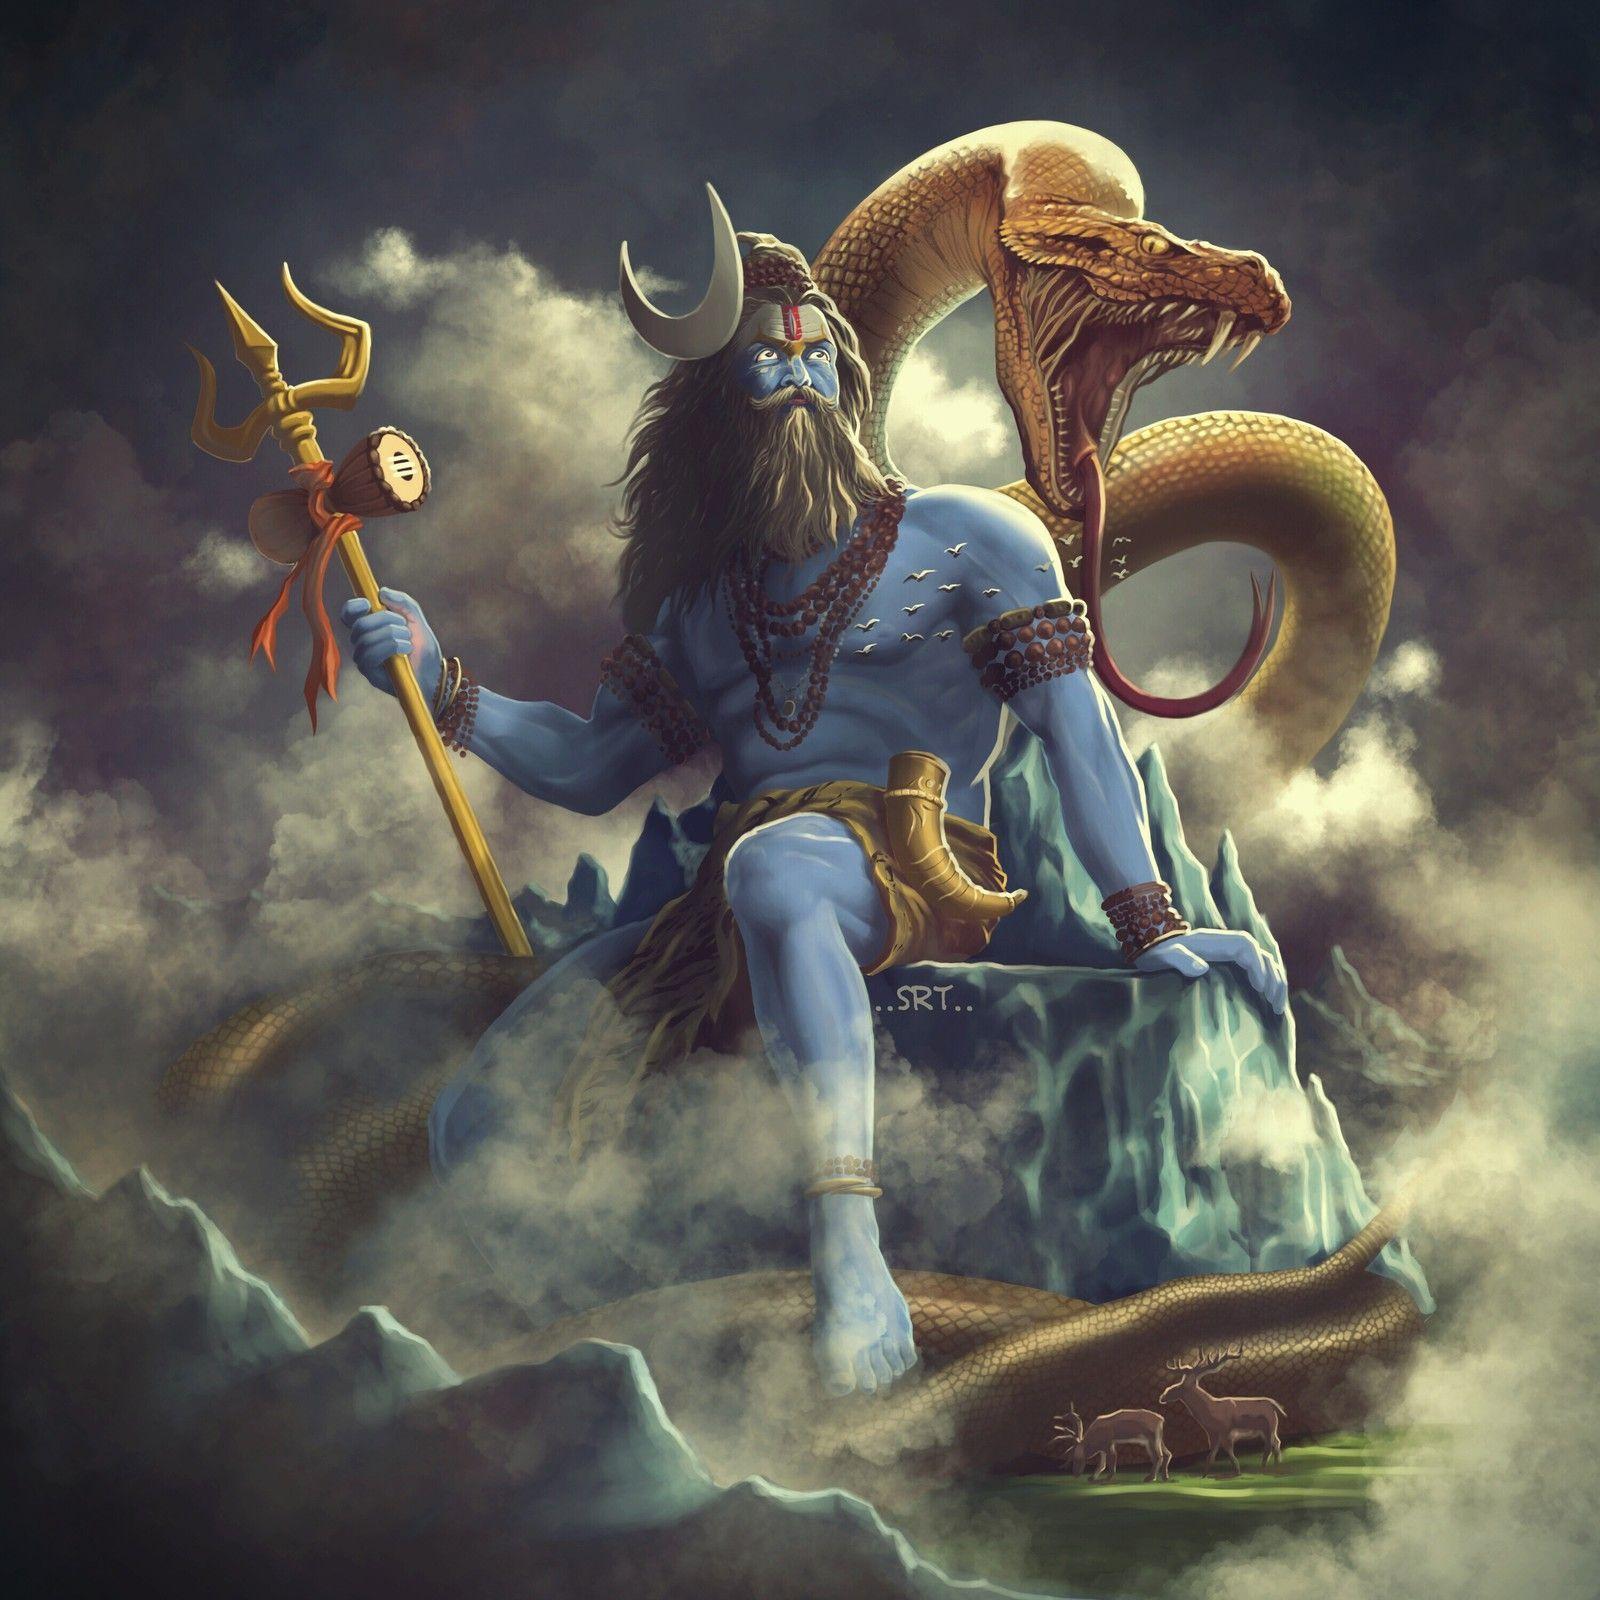 Lord Narasimha Miracles Images Photos Wallpapers Hd 2018: ArtStation Hanuman Hindu God Gaurav Kumar Drawings